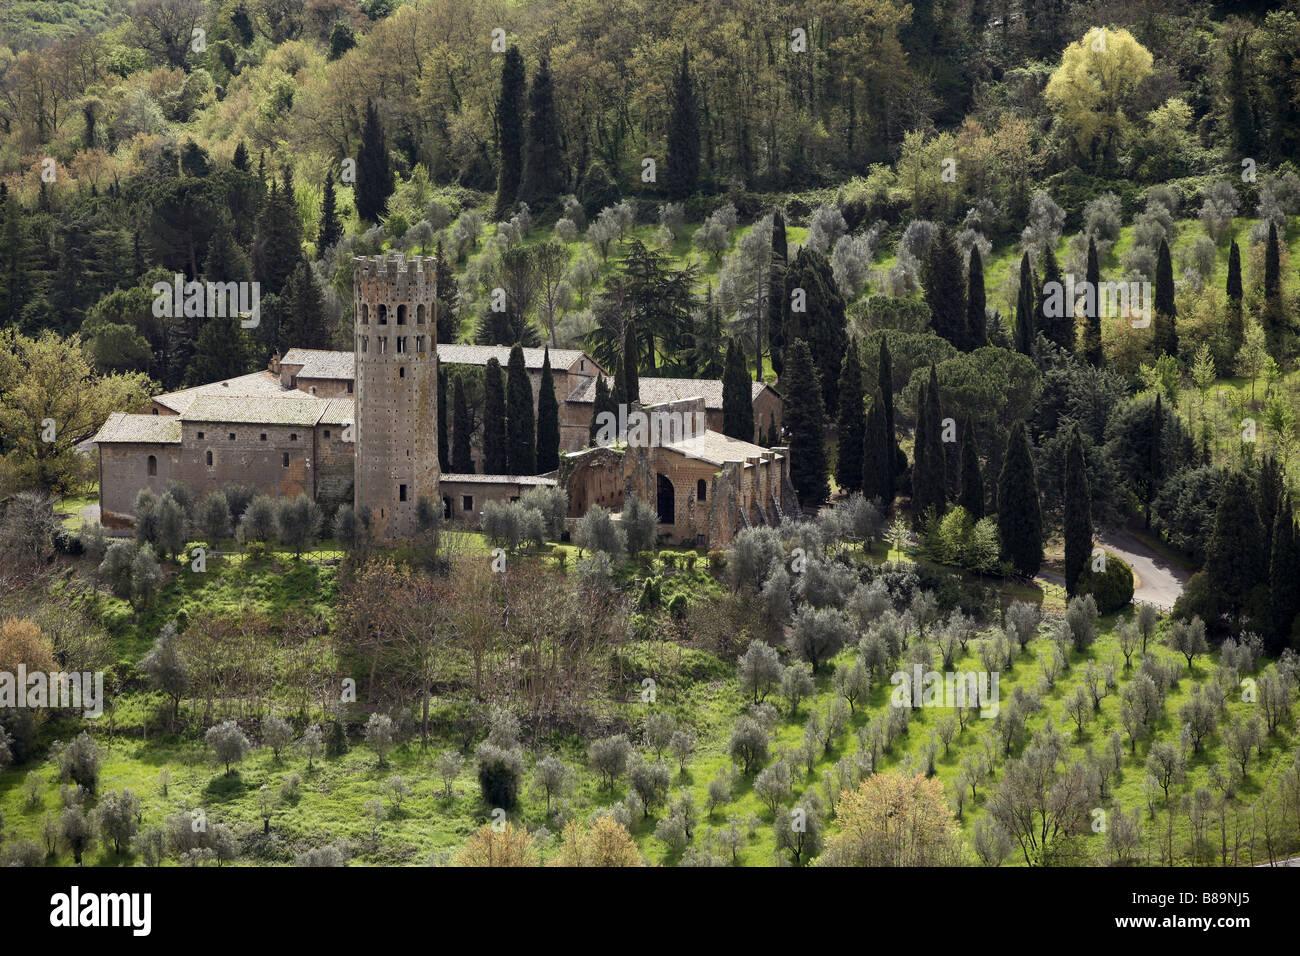 Hotels In Orvieto Italy